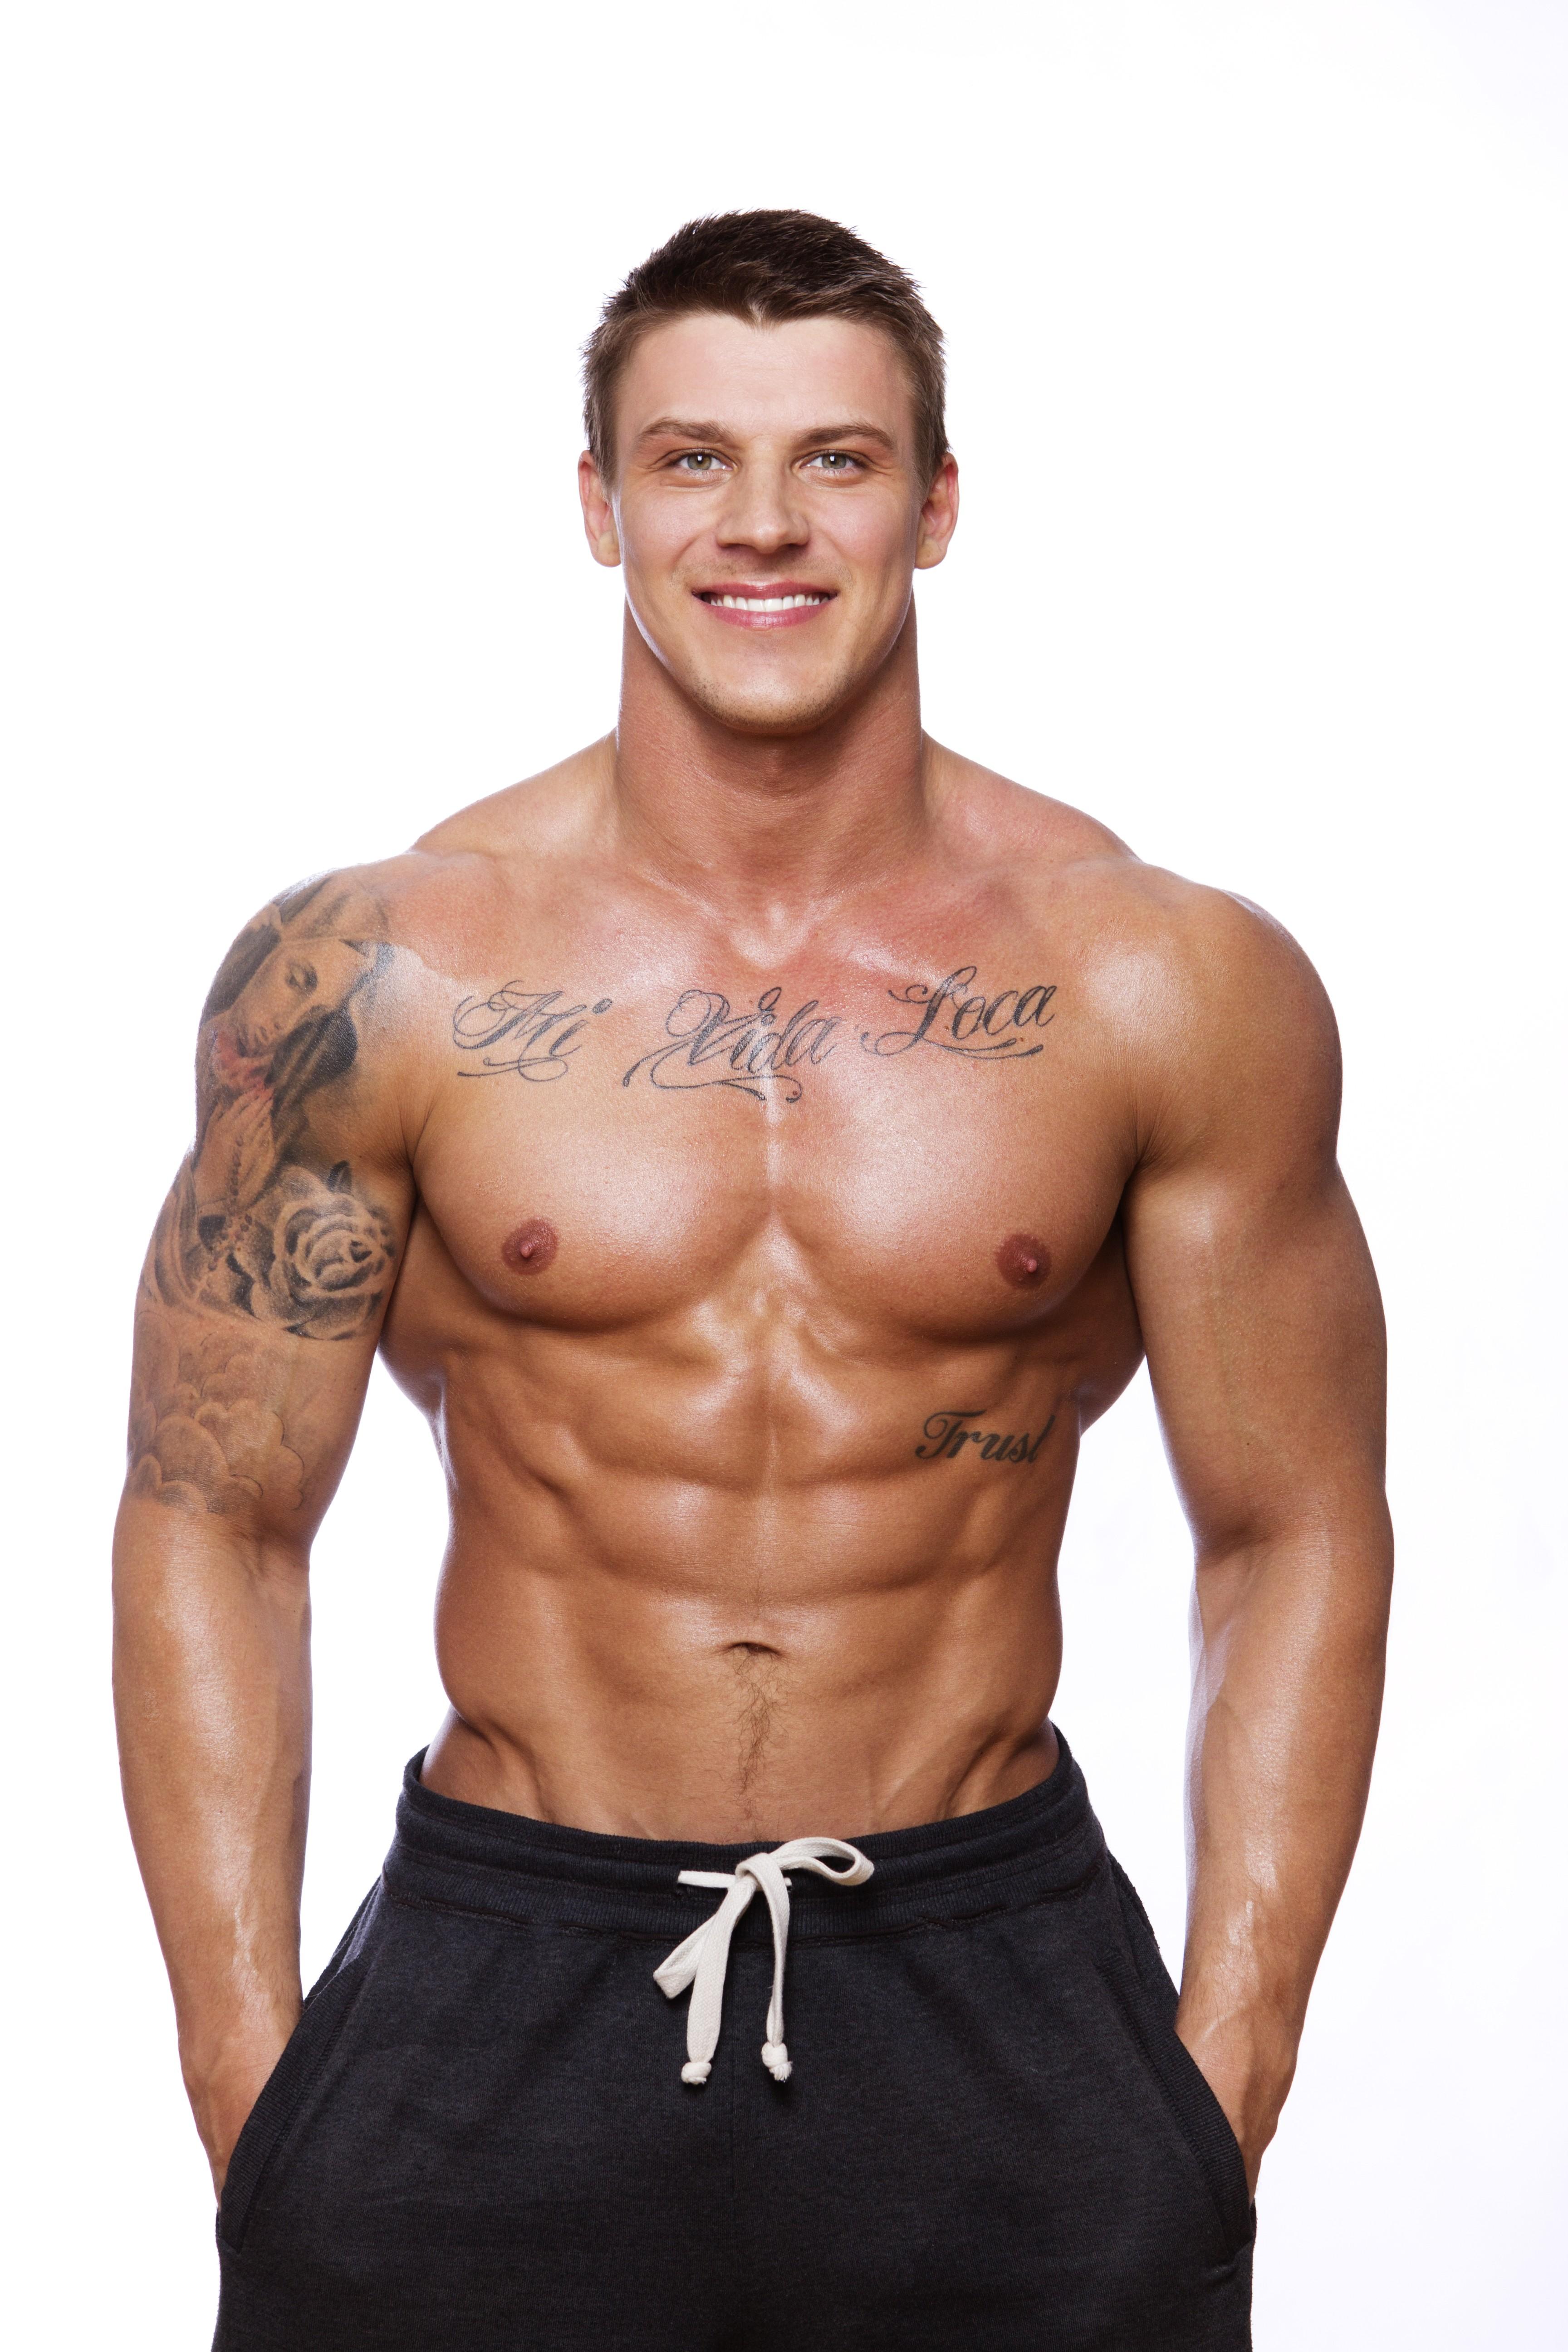 Wallpaper Model Bodybuilder Standing Shirtless Bodybuilding